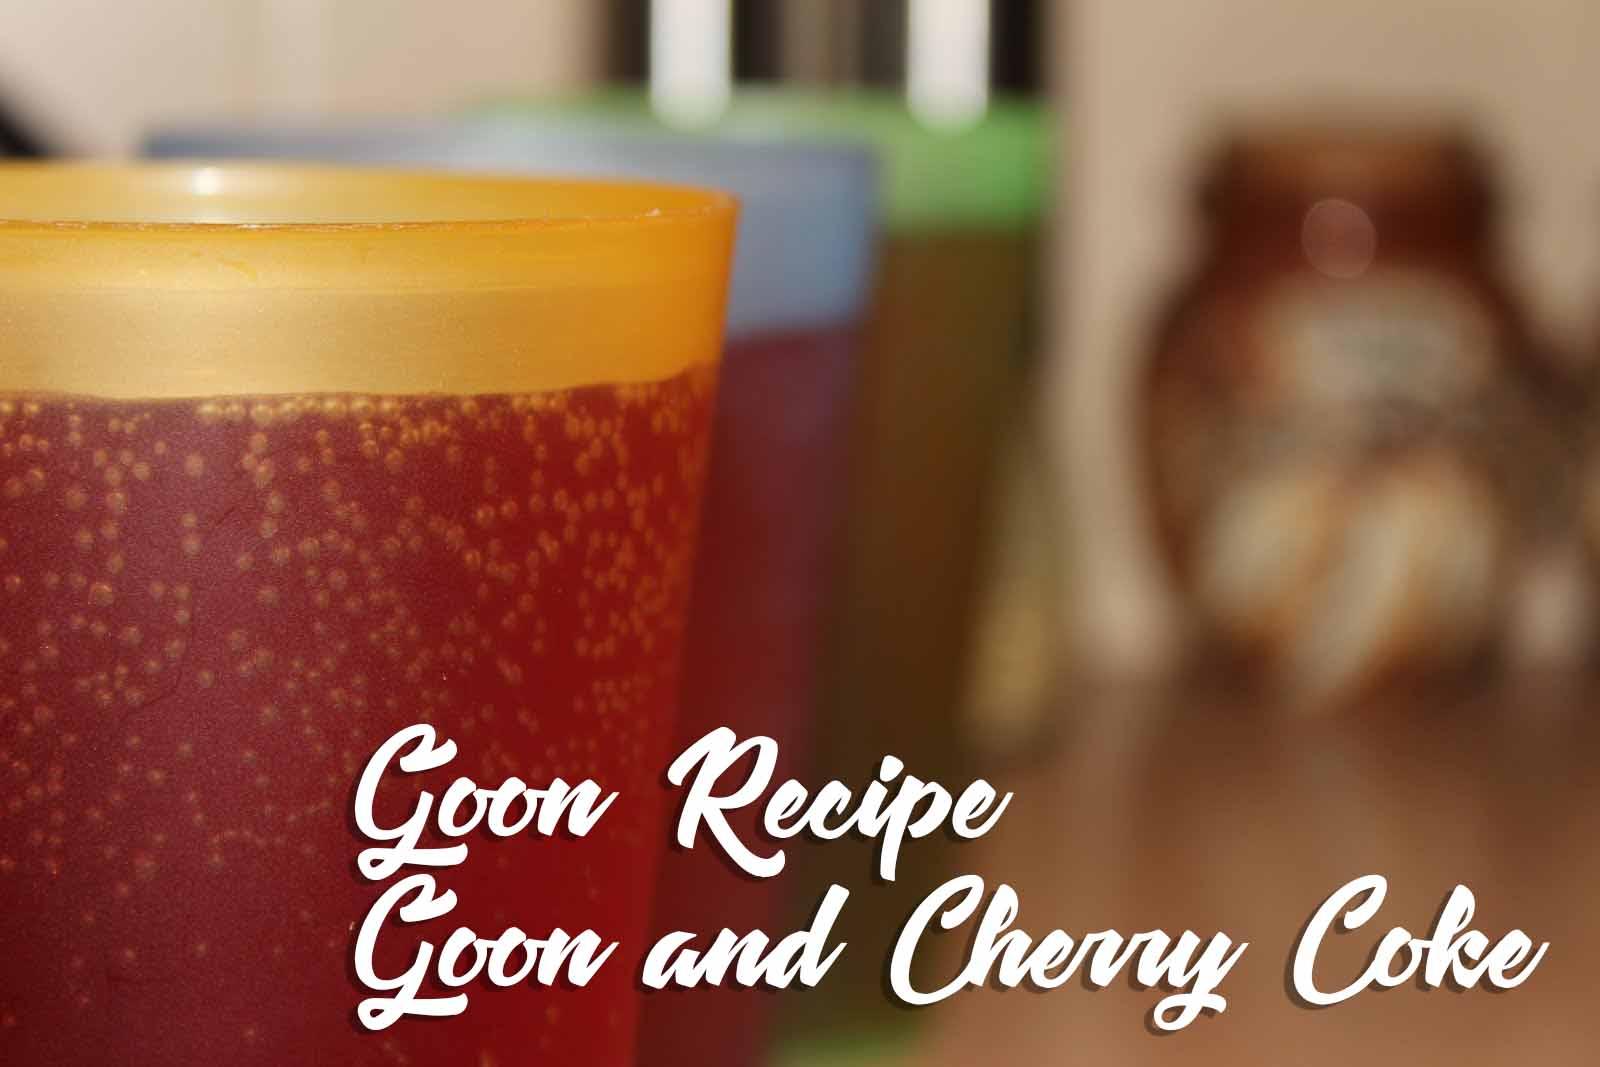 Goon_and_Cherry_Coke_Goon_Recipe